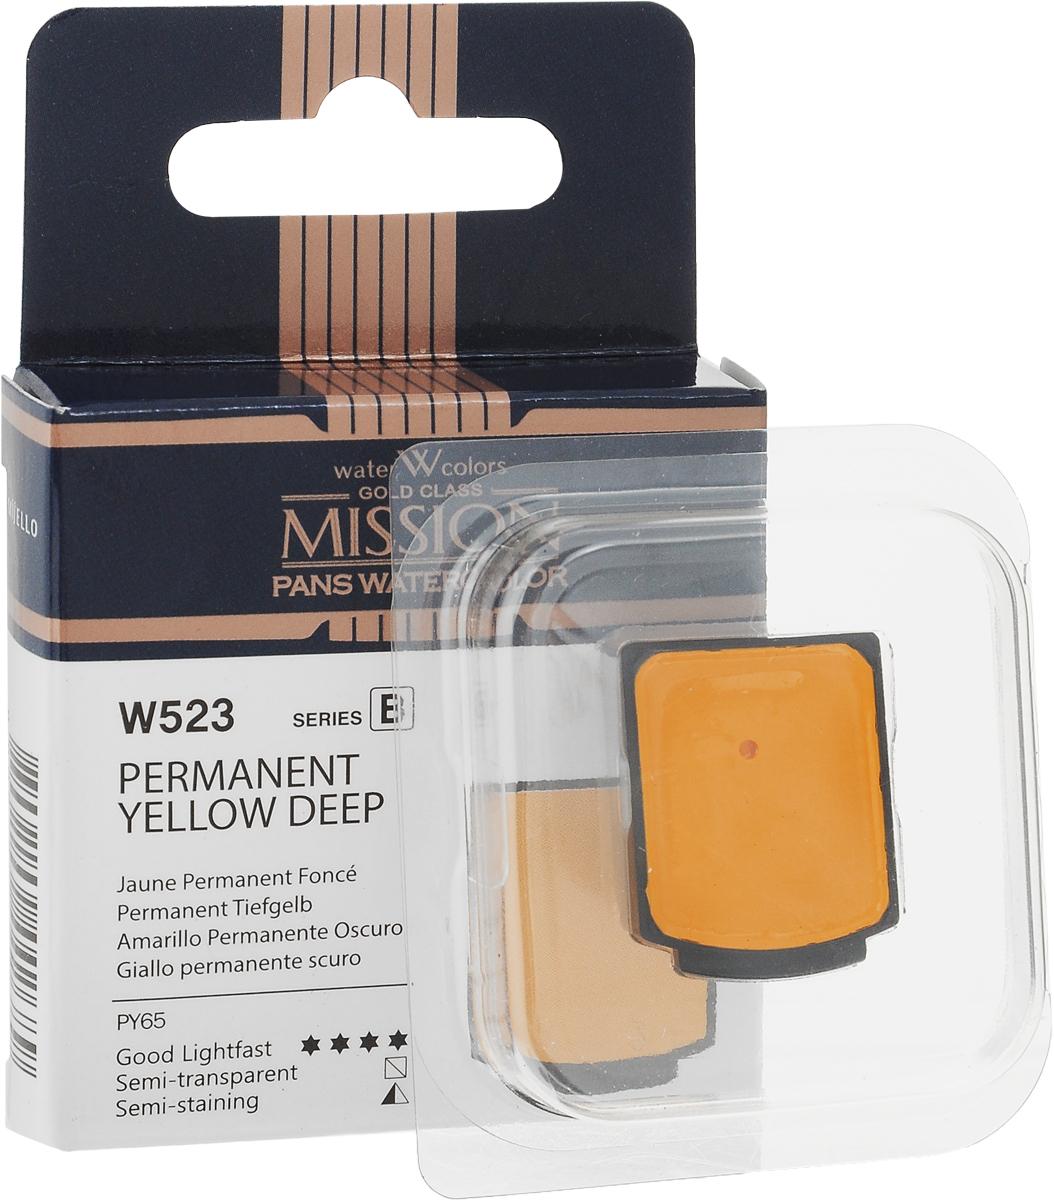 Фото - Mijello Акварель Mission Gold Pan W523 Желтый темный перманентный 2 мл MPW-W523 блок питания accord atx 1000w gold acc 1000w 80g 80 gold 24 8 4 4pin apfc 140mm fan 7xsata rtl